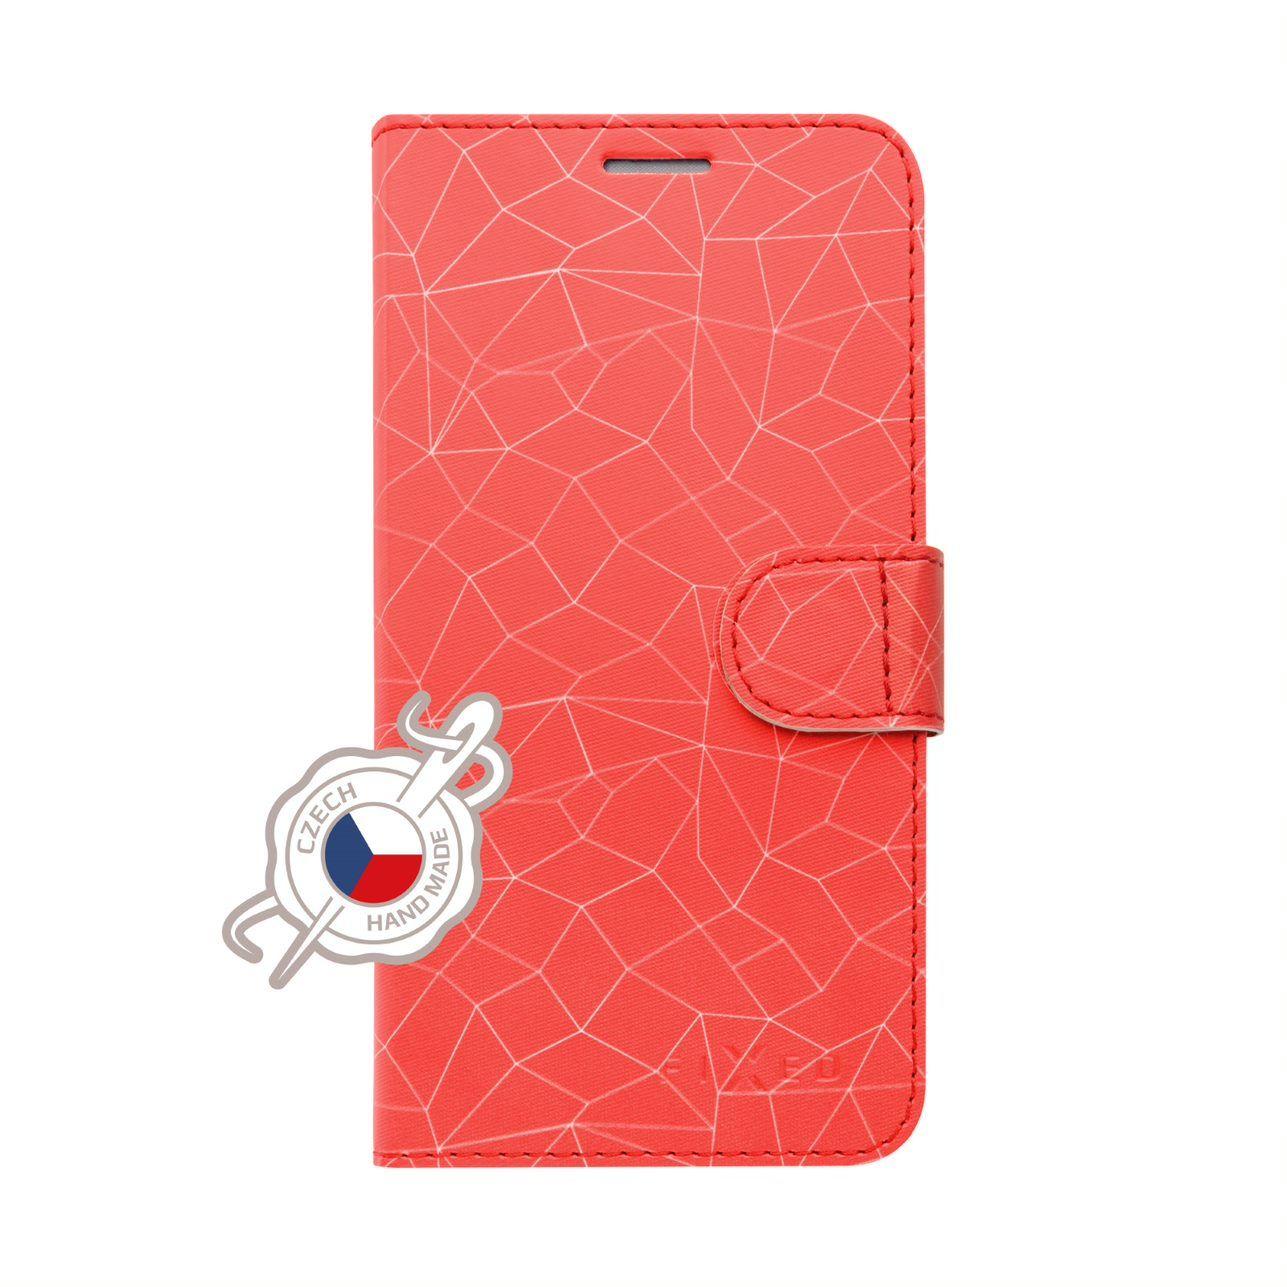 Pouzdro typu kniha FIXED FIT pro Samsung Galaxy Xcover 4/4S, motiv Red Mesh